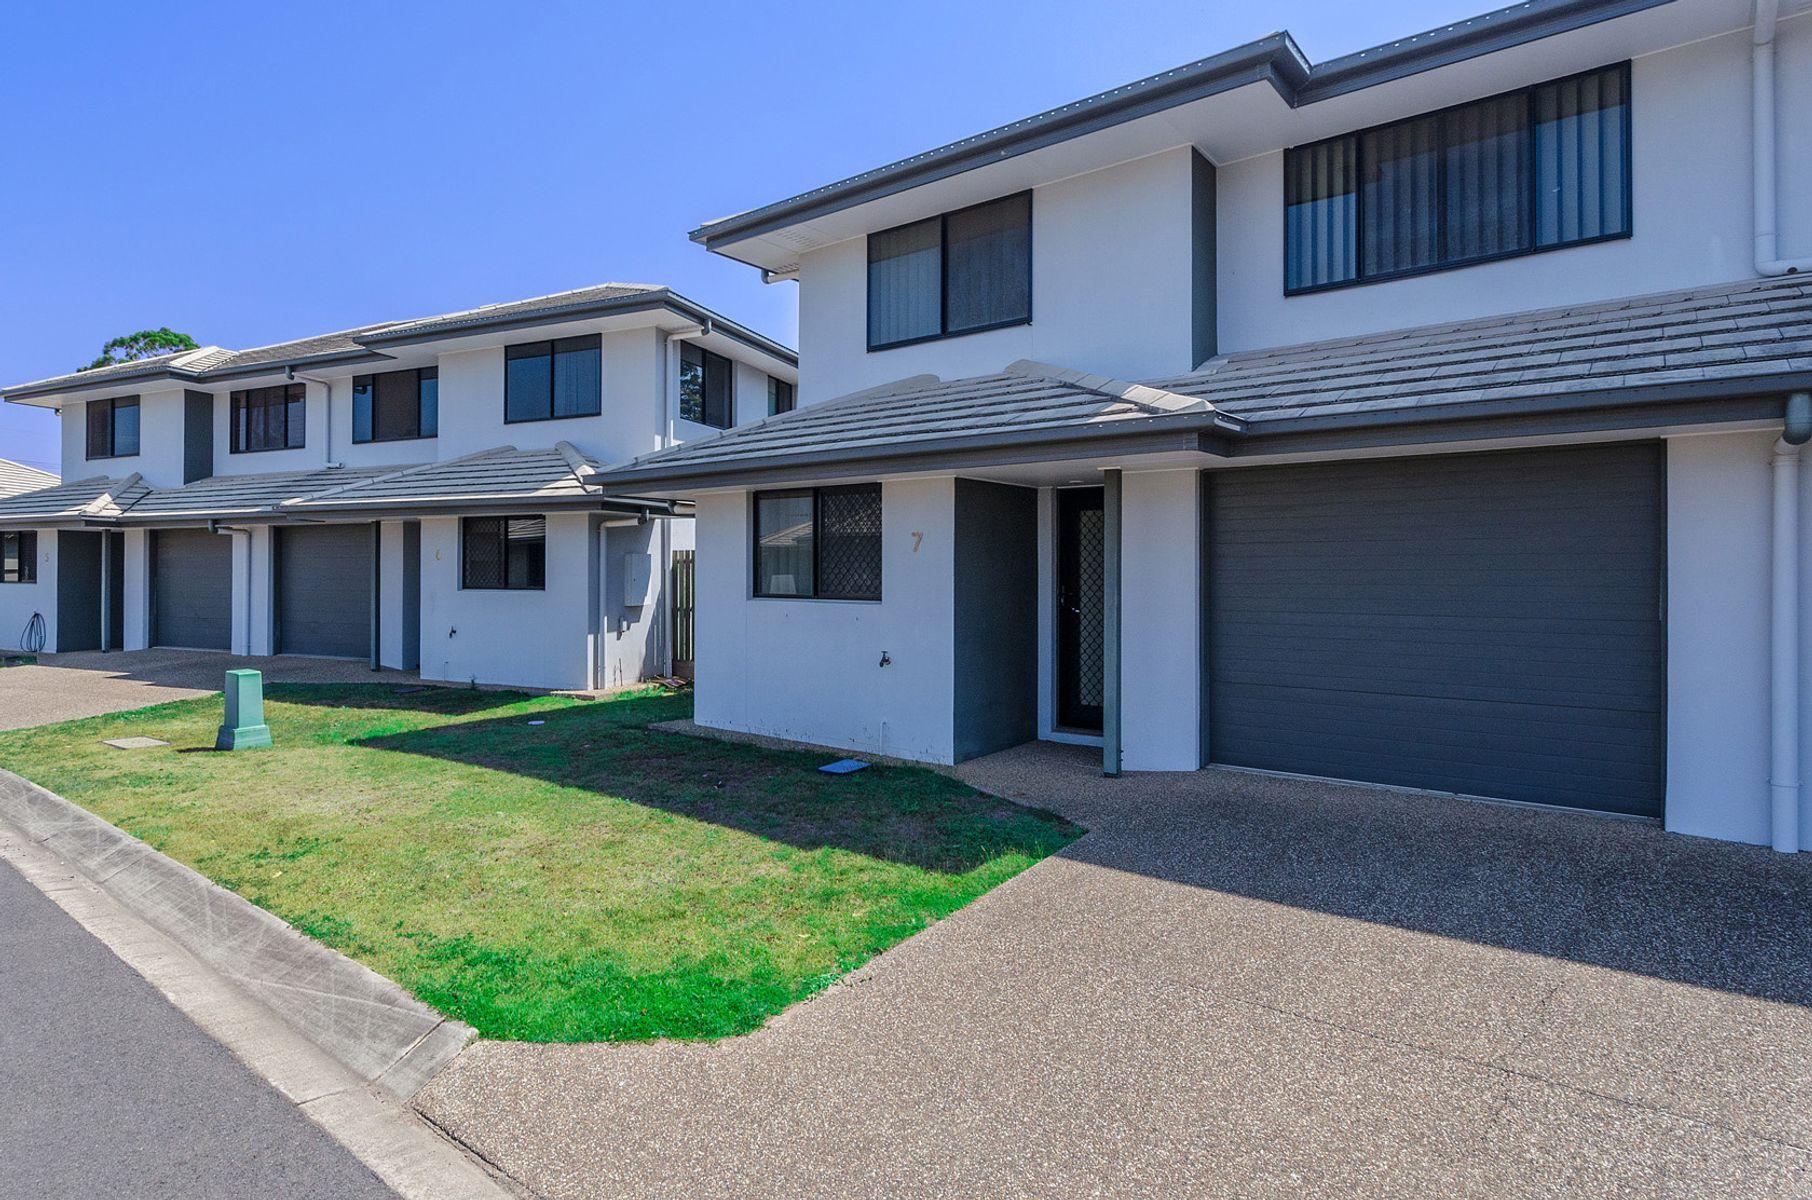 7/15A Avoca Street, Bundaberg West, QLD 4670